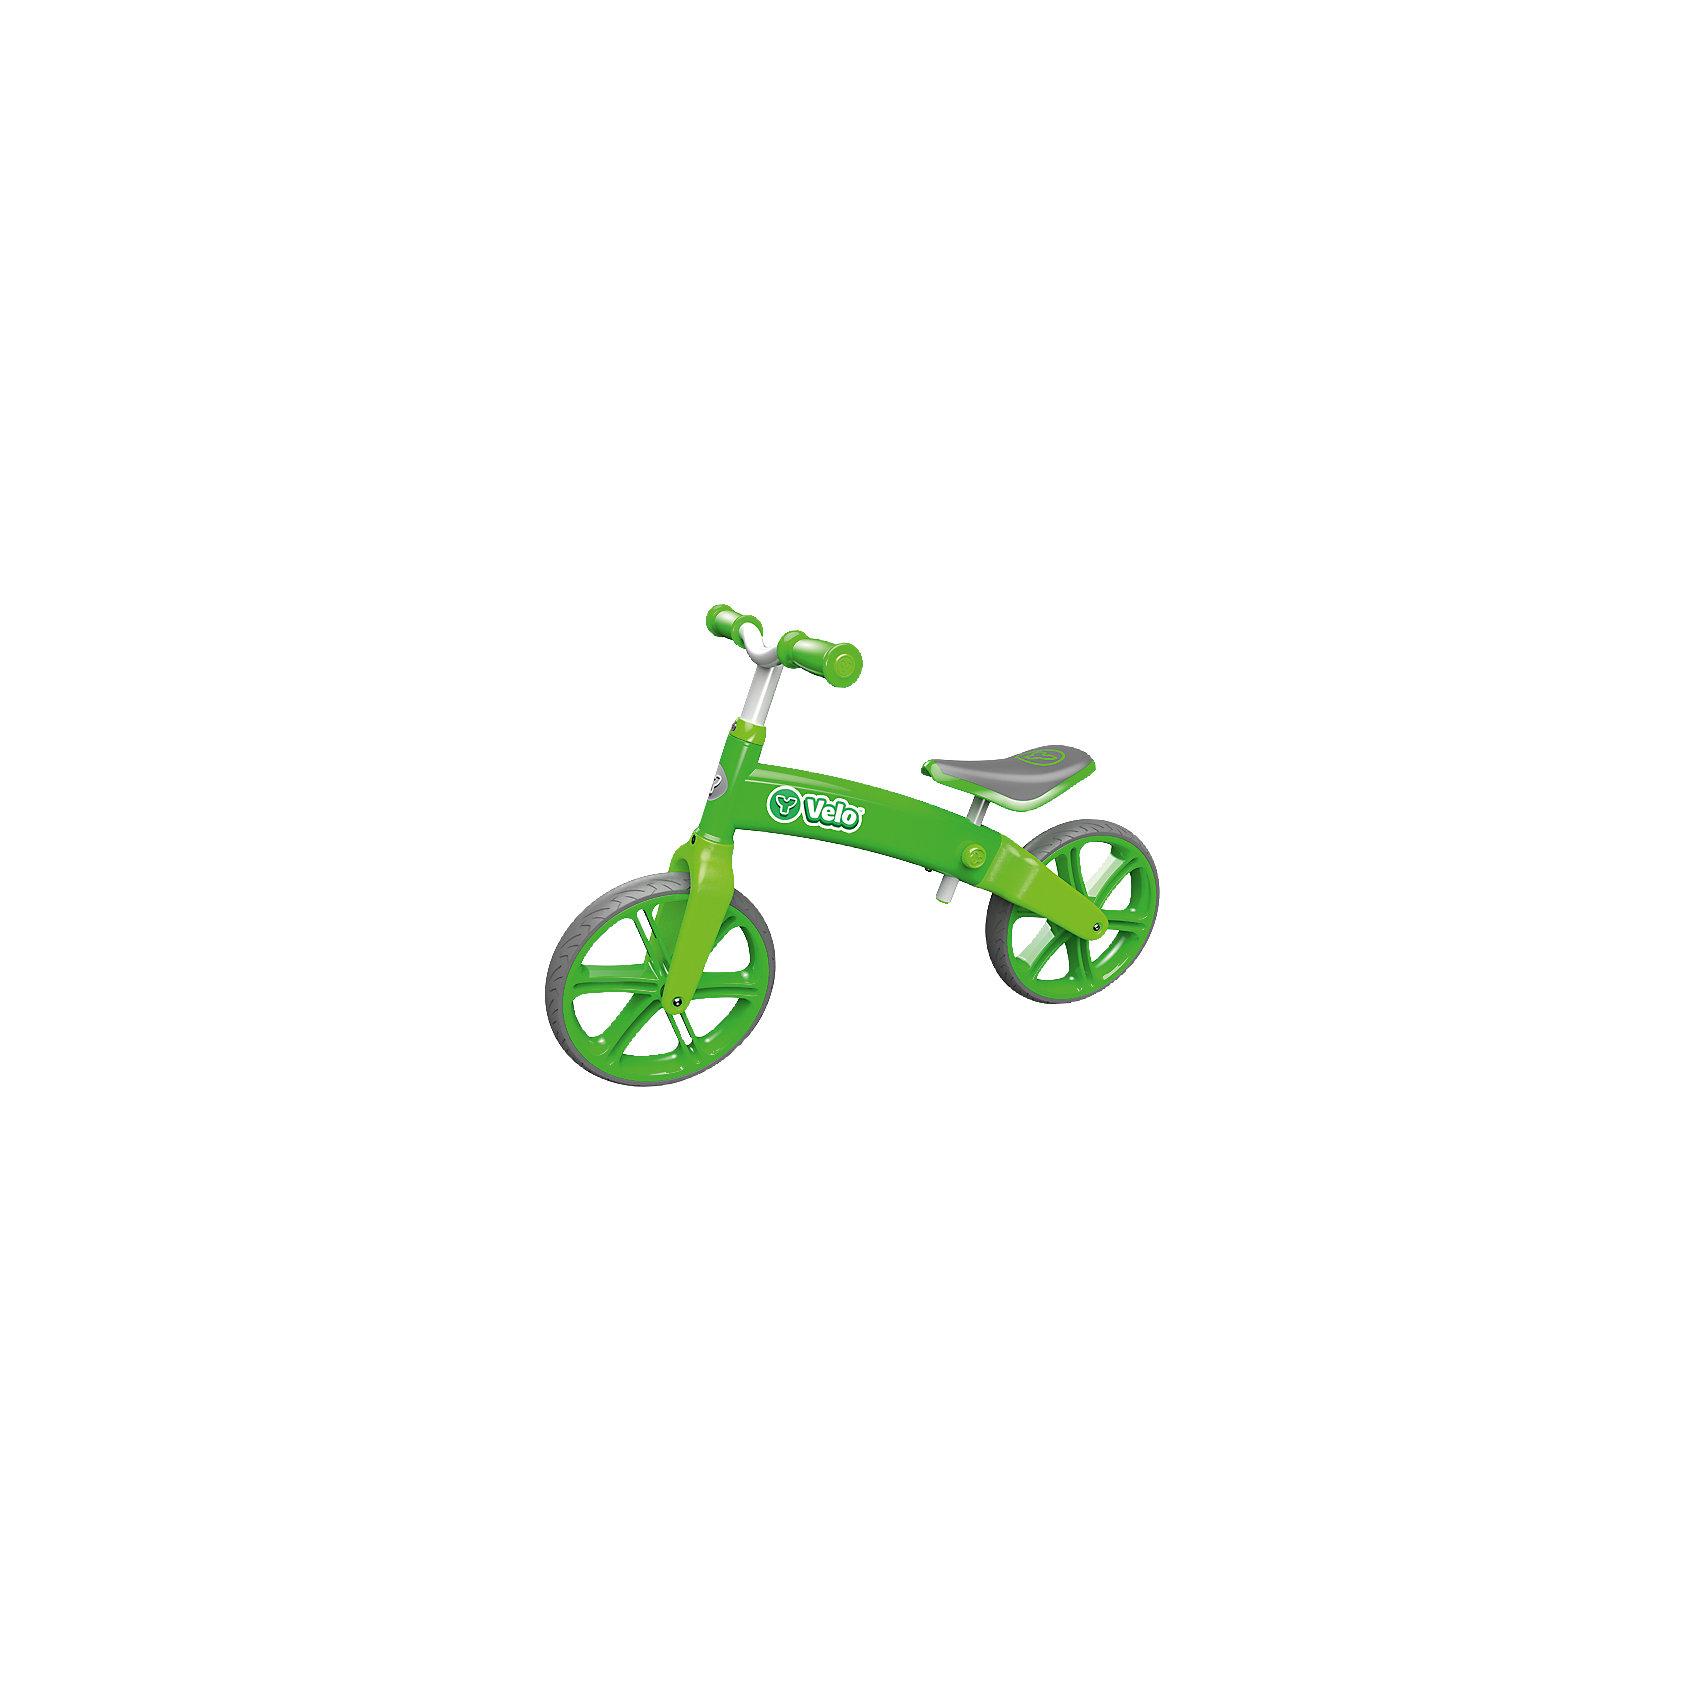 Двухколесный беговел Velo Balance, зеленый, Y-BikeБеговелы<br><br><br>Ширина мм: 624<br>Глубина мм: 291<br>Высота мм: 200<br>Вес г: 4632<br>Цвет: зеленый<br>Возраст от месяцев: 36<br>Возраст до месяцев: 60<br>Пол: Унисекс<br>Возраст: Детский<br>SKU: 4592674